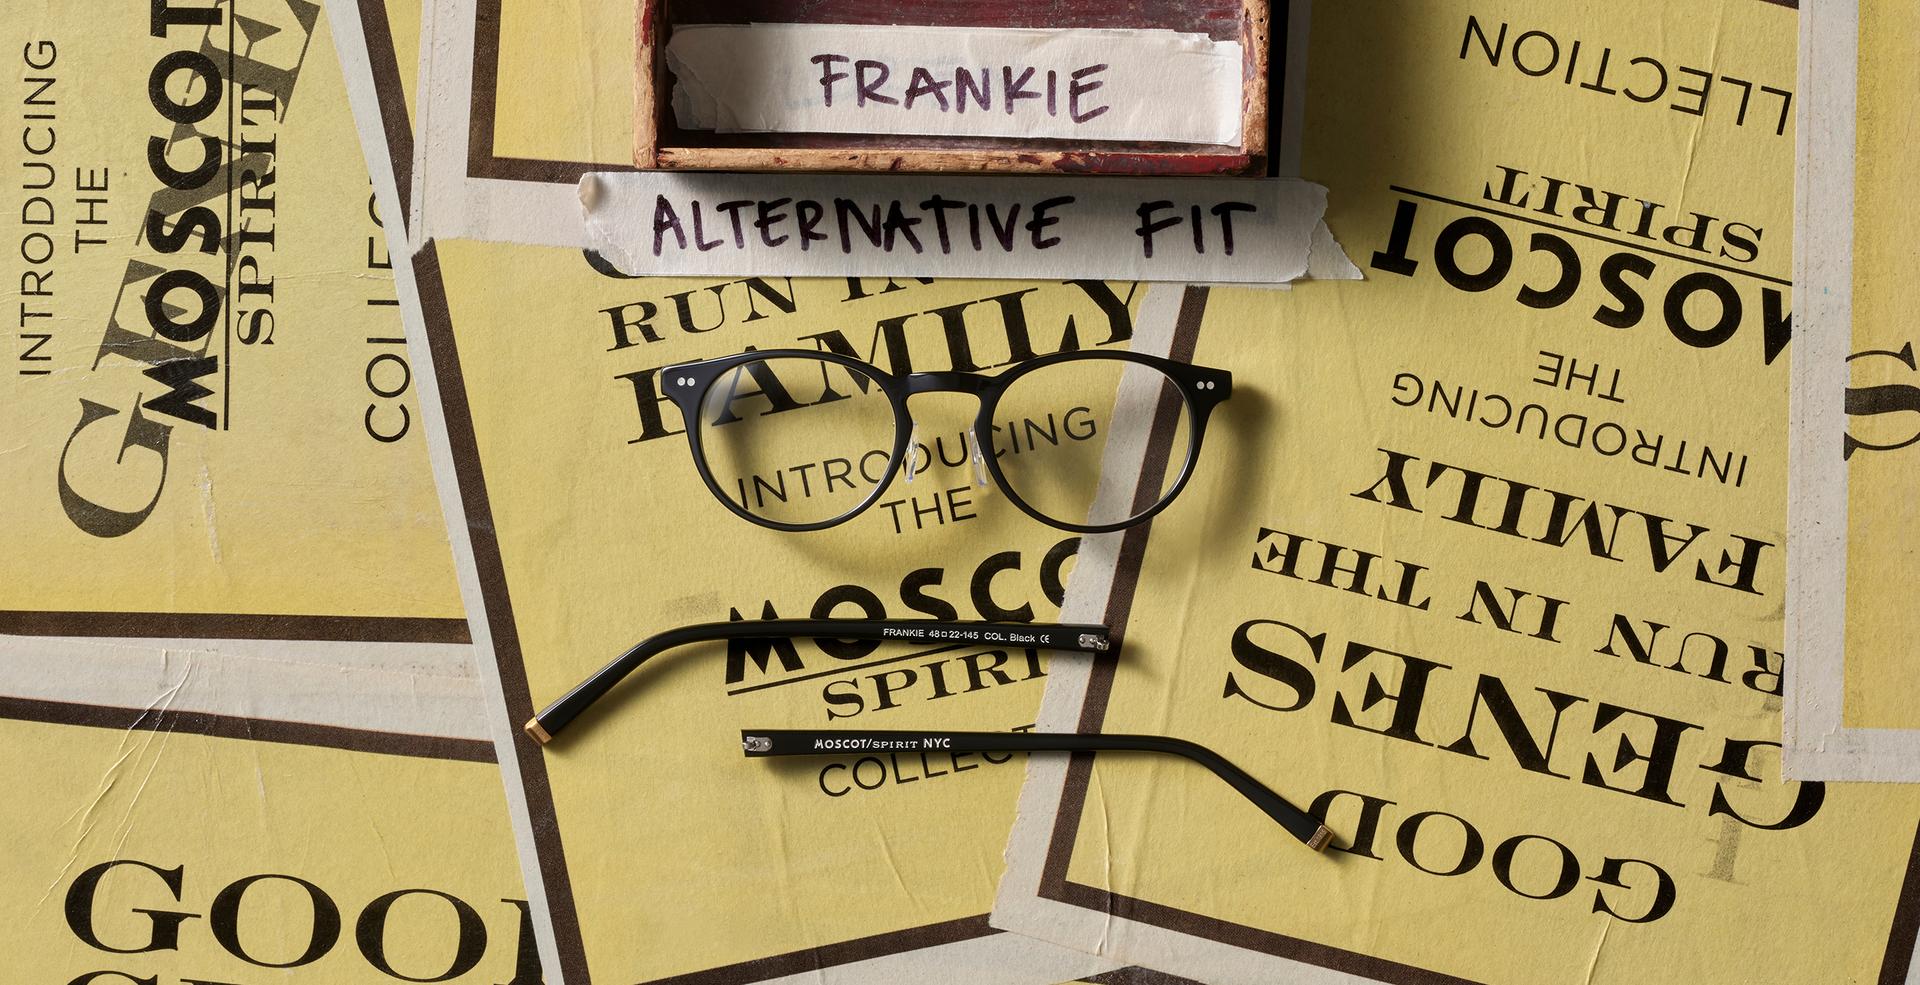 FRANKIE Alternative Fit